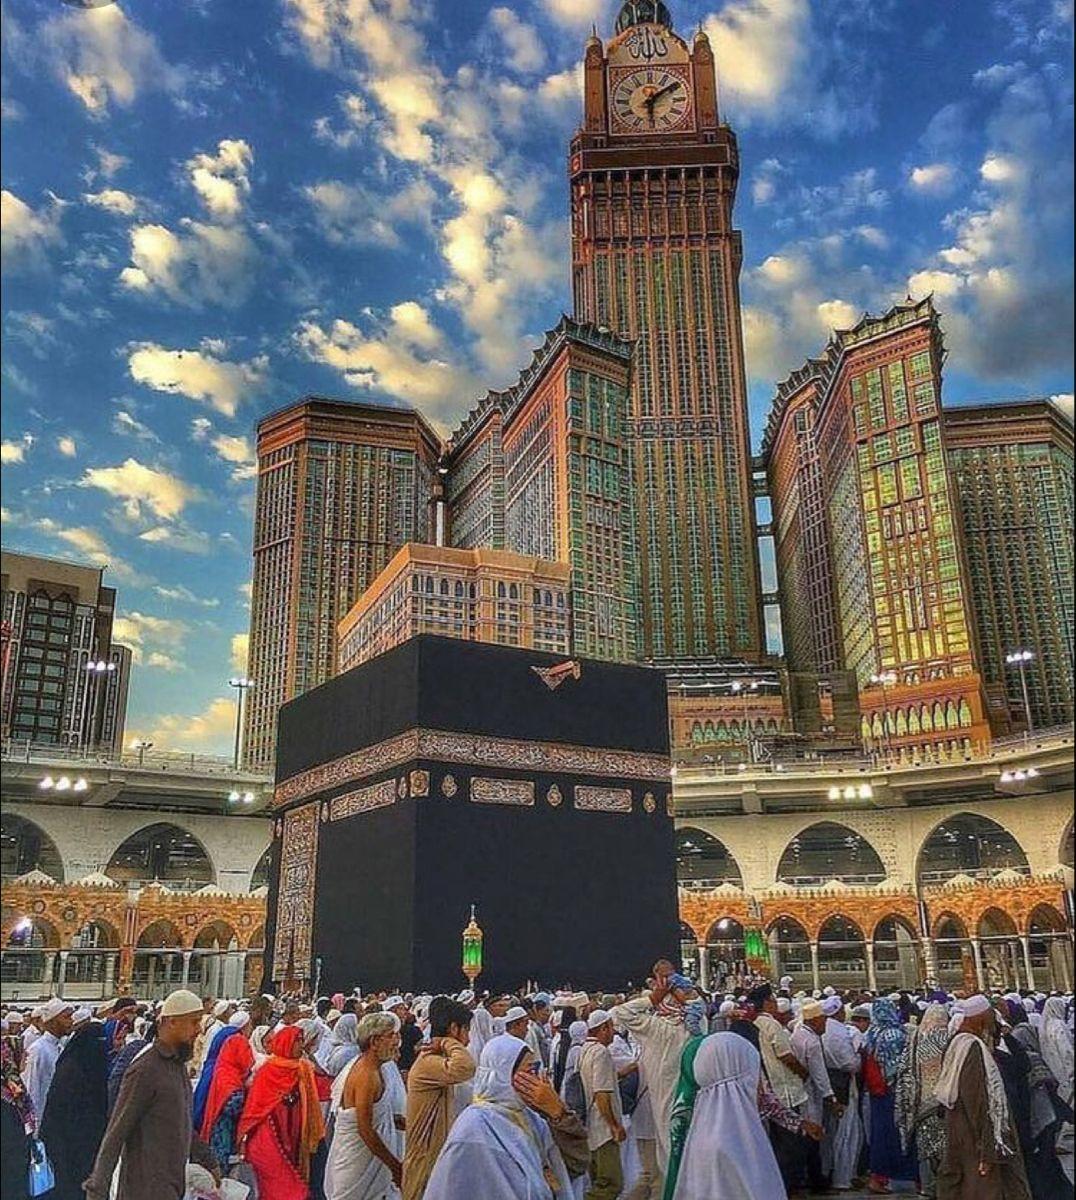 Pin Oleh U F Di Islam Wallpaper Islami Arsitektur Islamis Fotografi Arsitektur